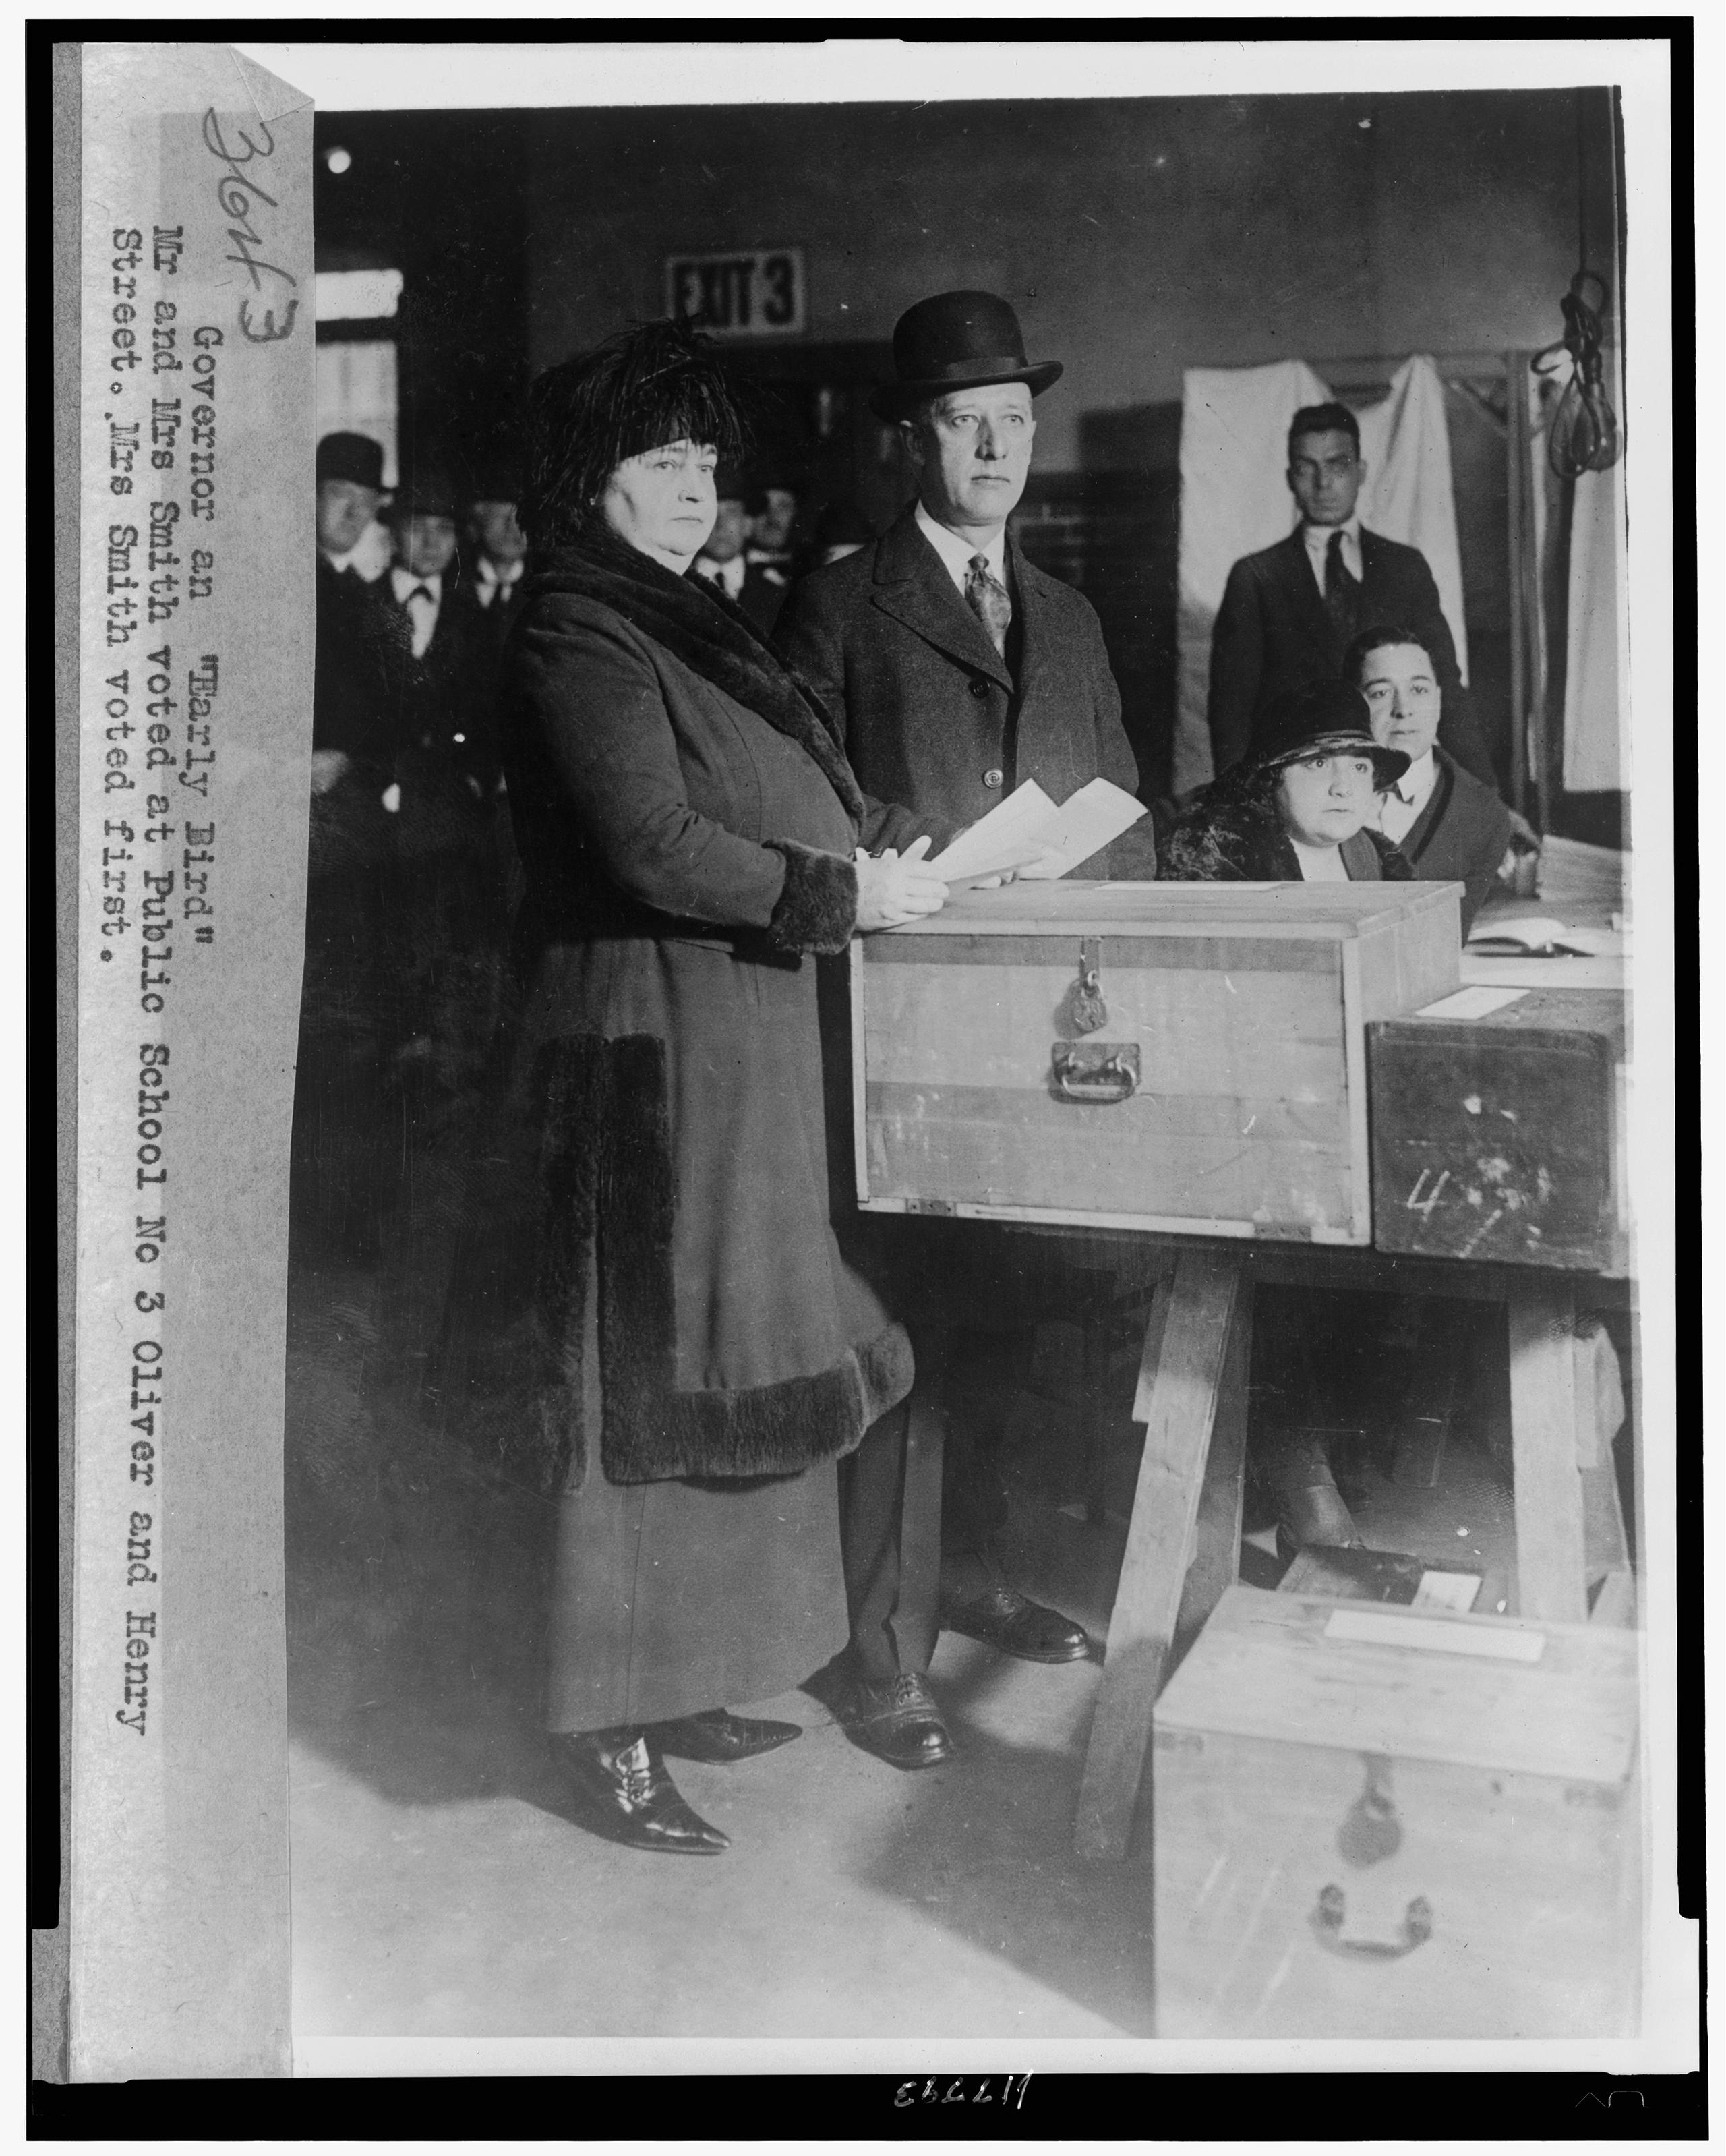 New York Governor Al Smith and his wife voting at Public School No. 3, circa 1928.